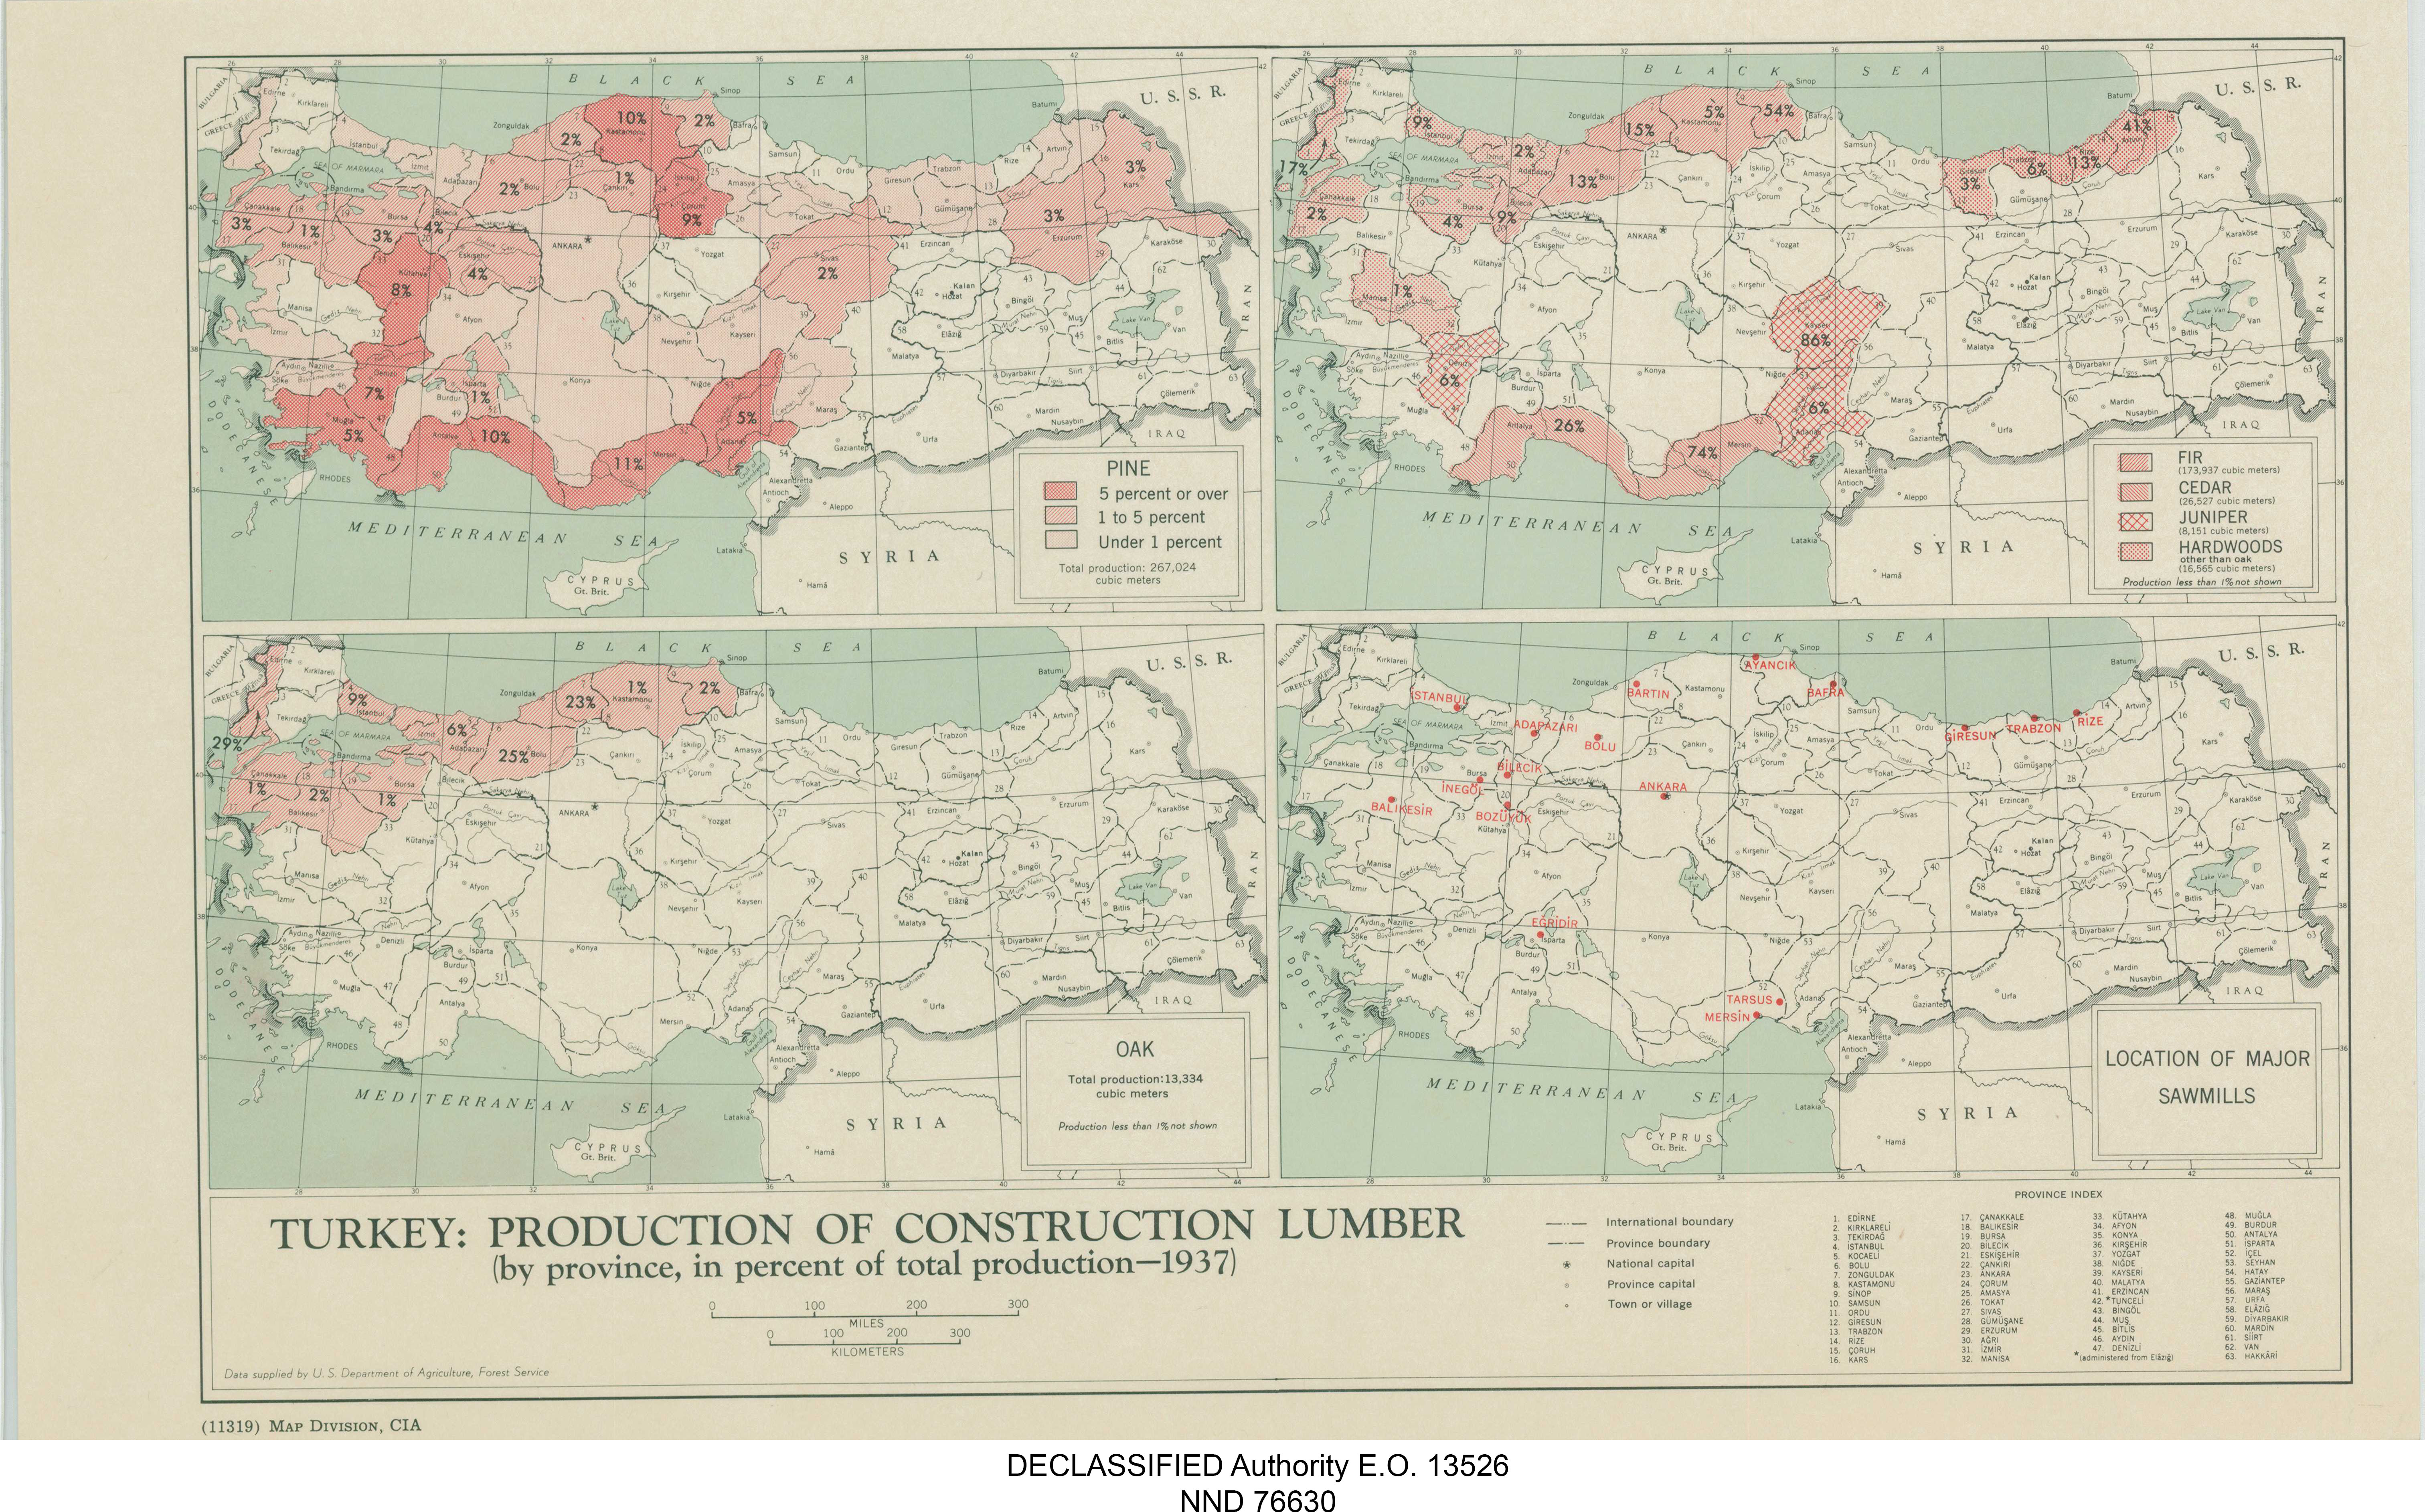 Turkey Production of Construction Lumber